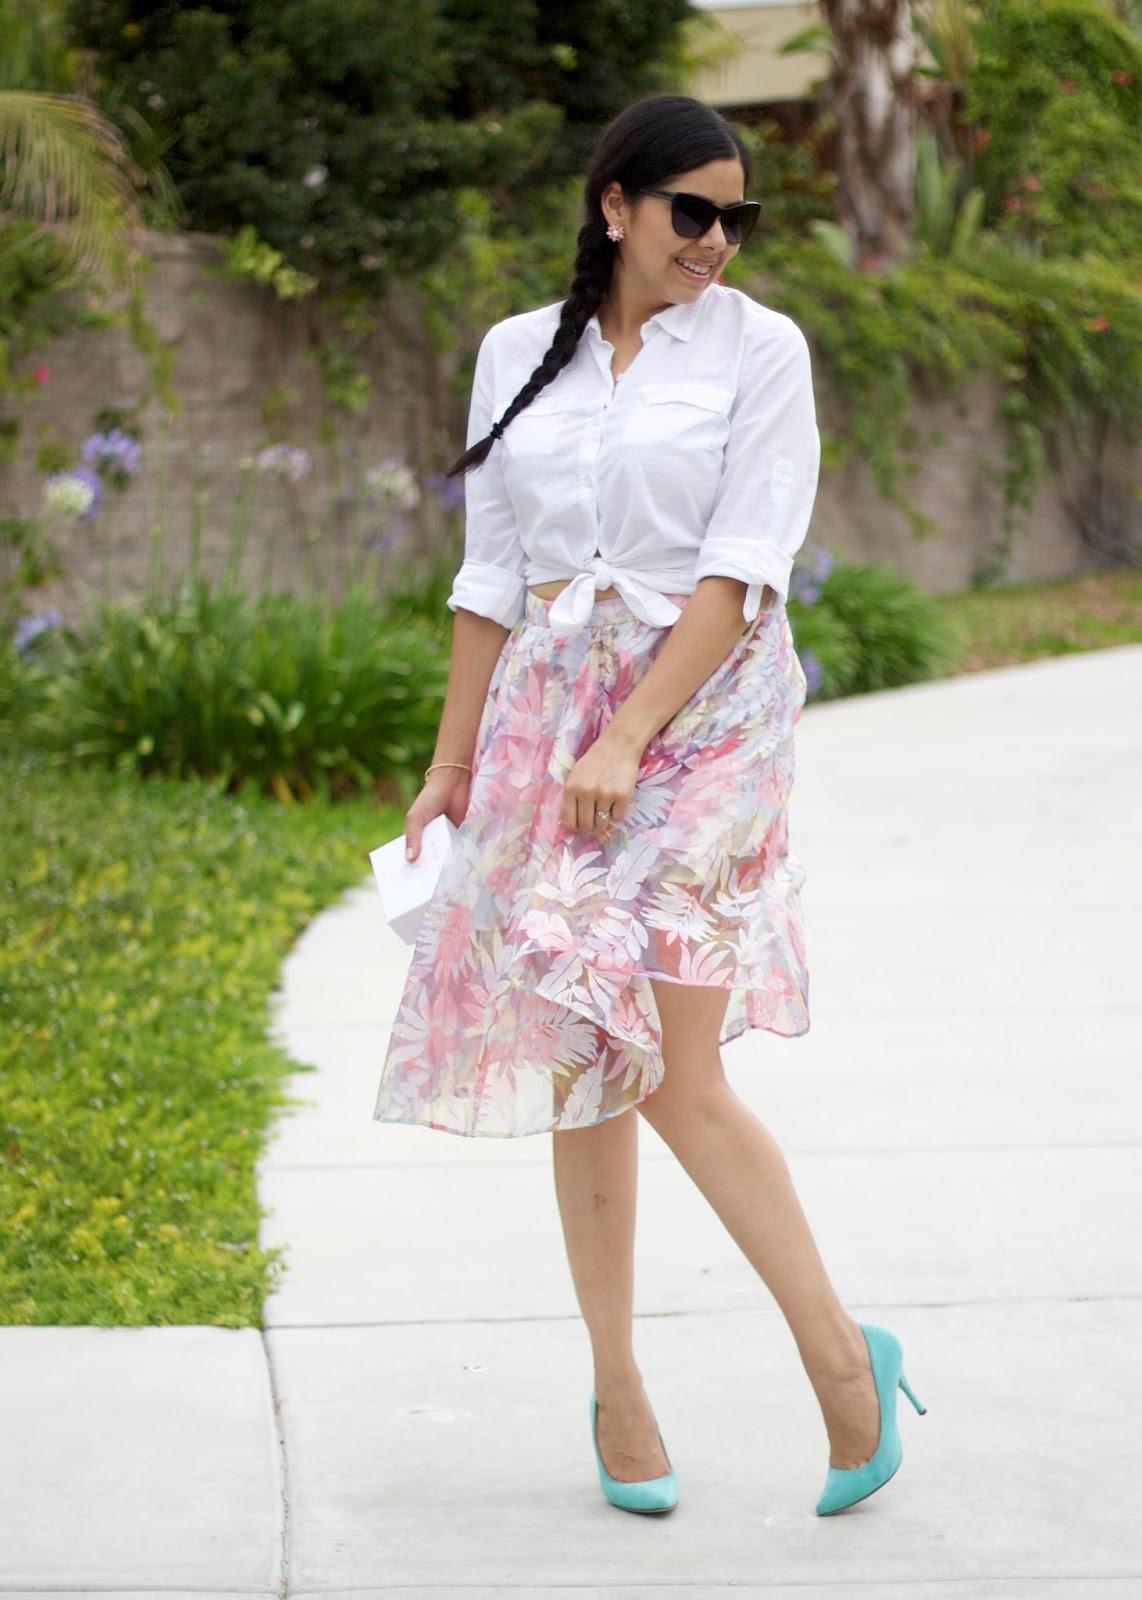 mint heels outfit, lulus mint heels, shop loeil skirt, pastel skirt, floral pastel skirt, floral midi skirt